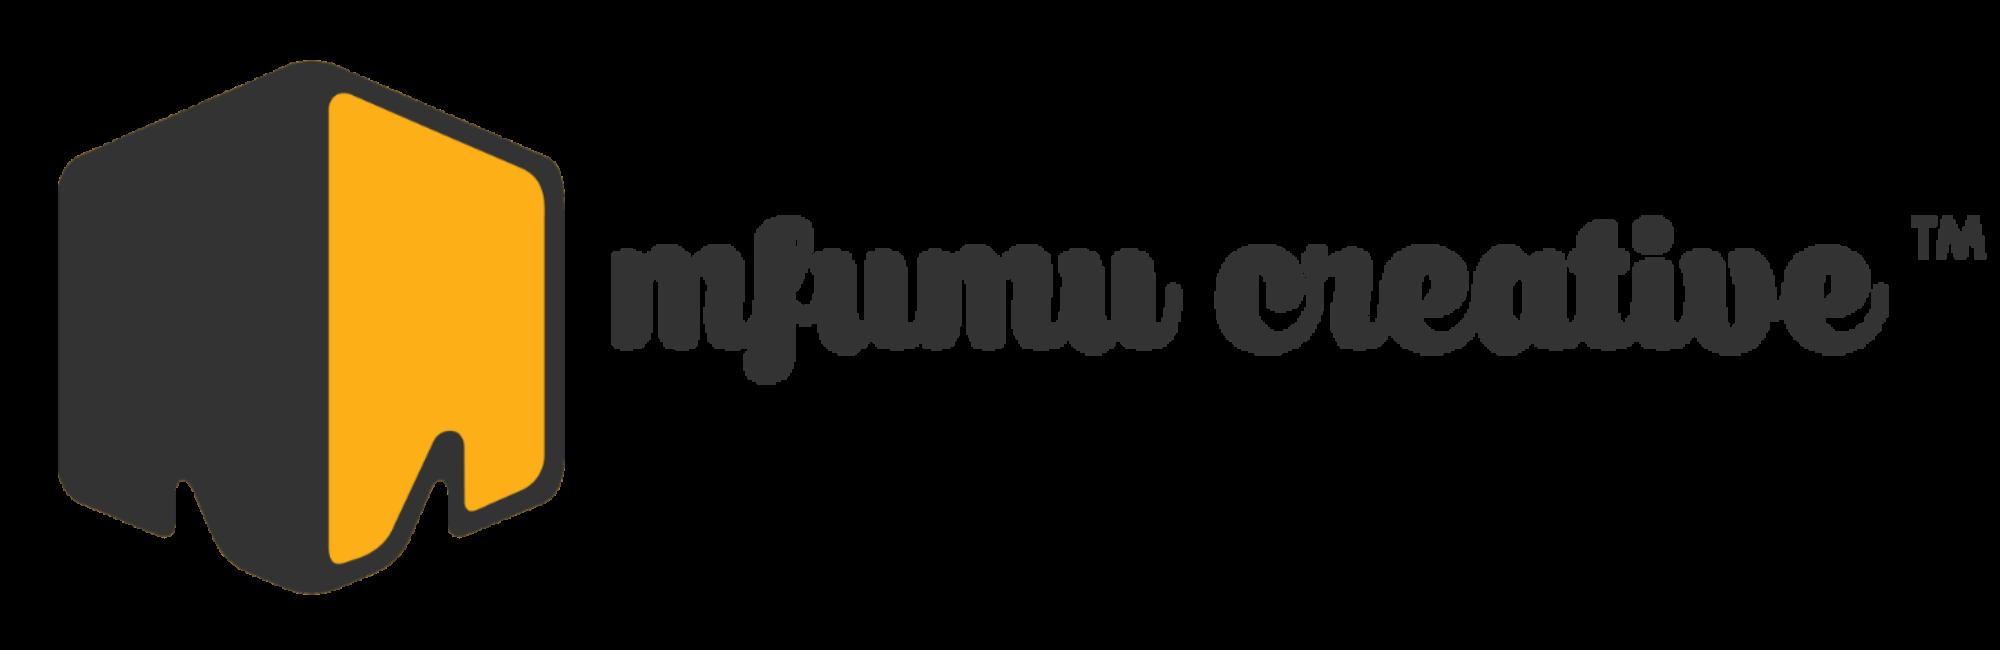 Mfumu Creative